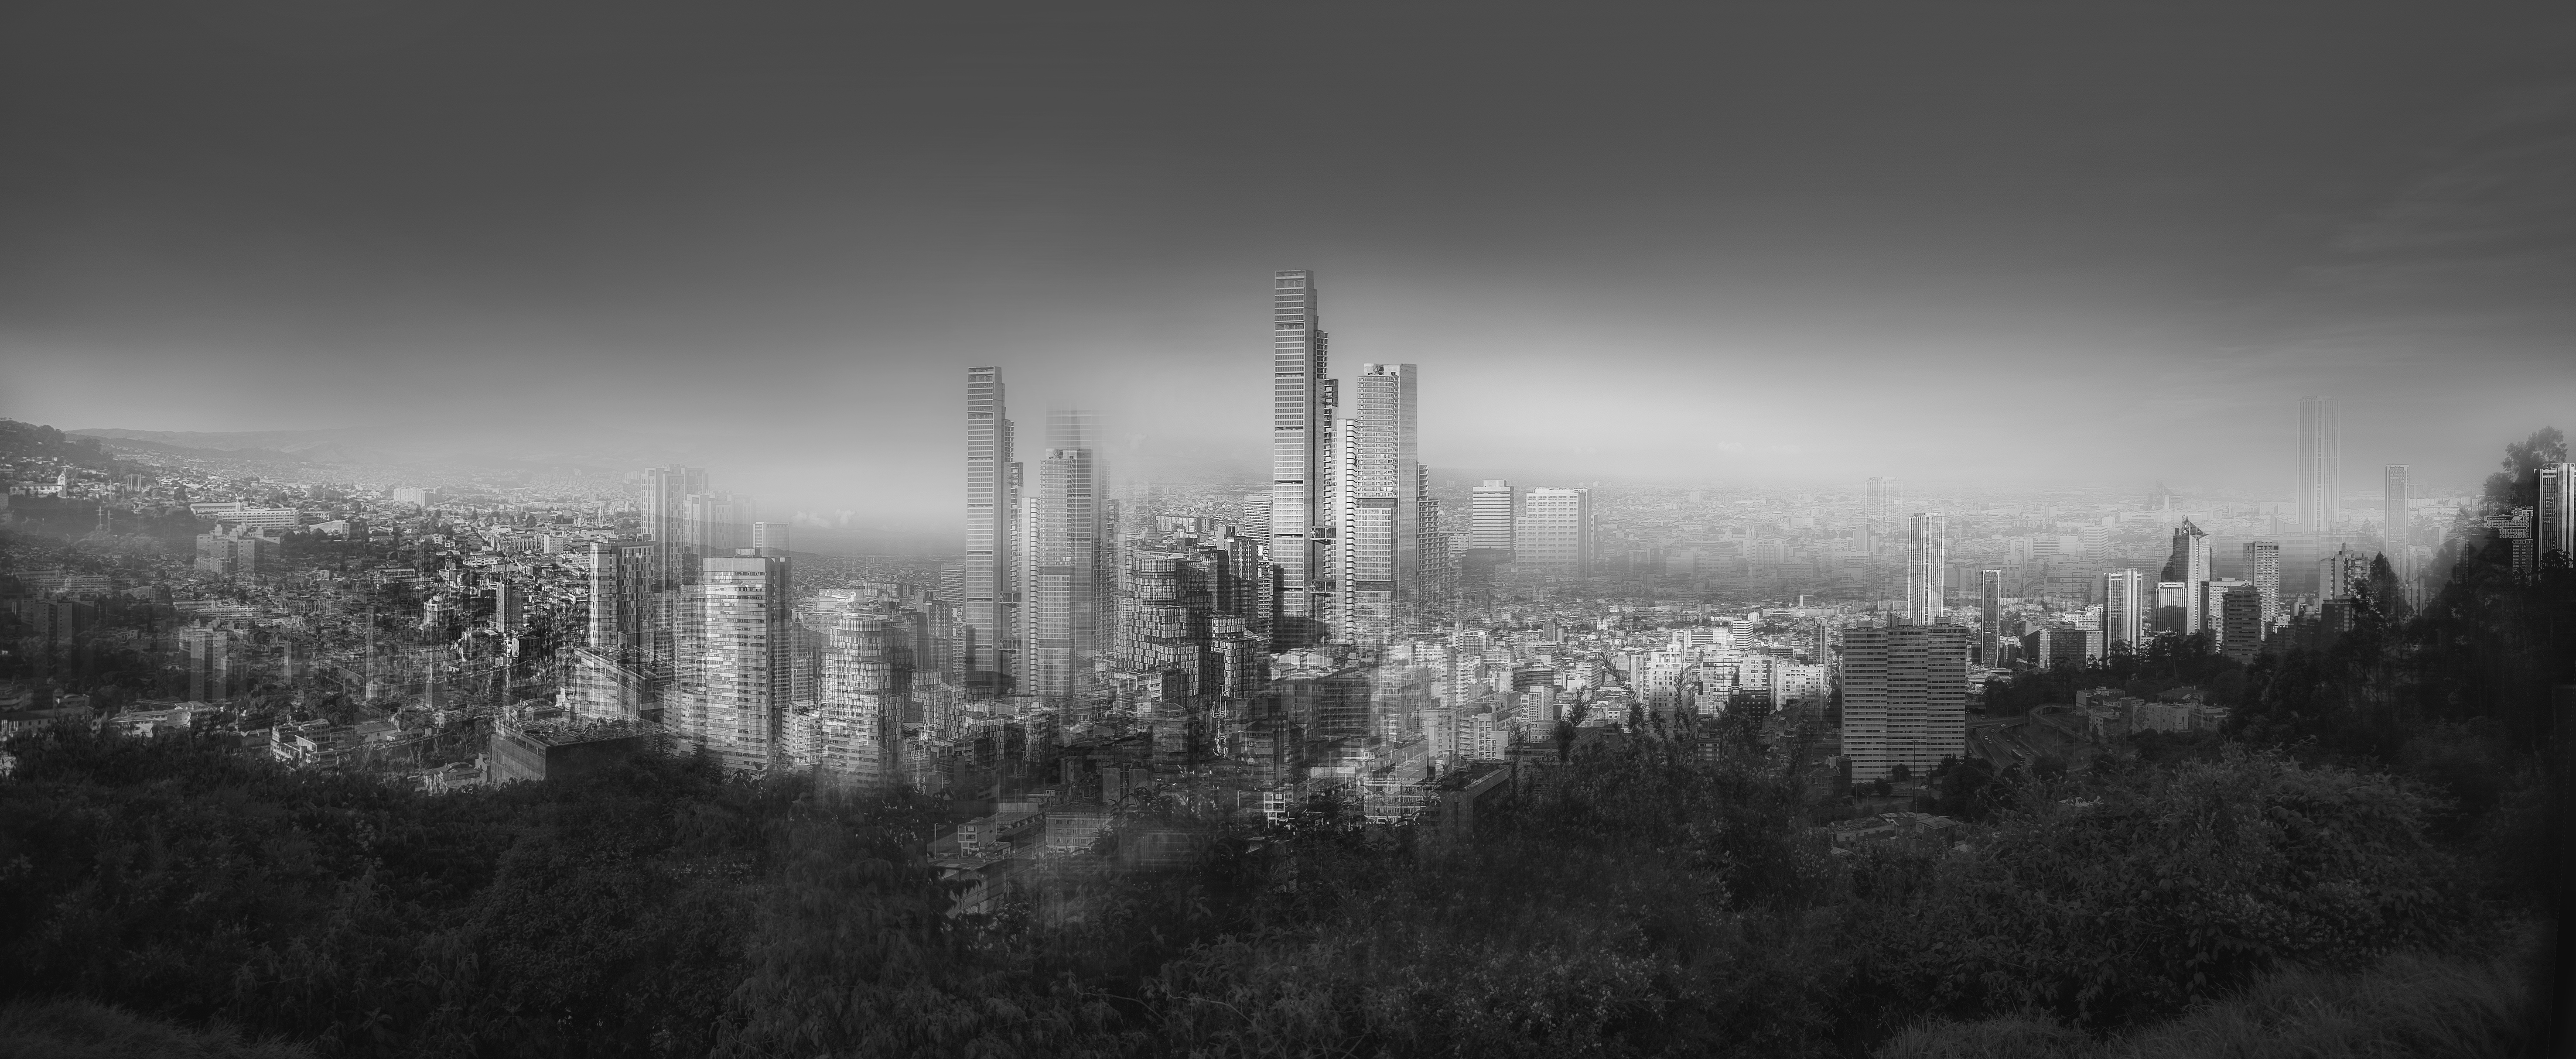 panoramica_inter_byn_impresión